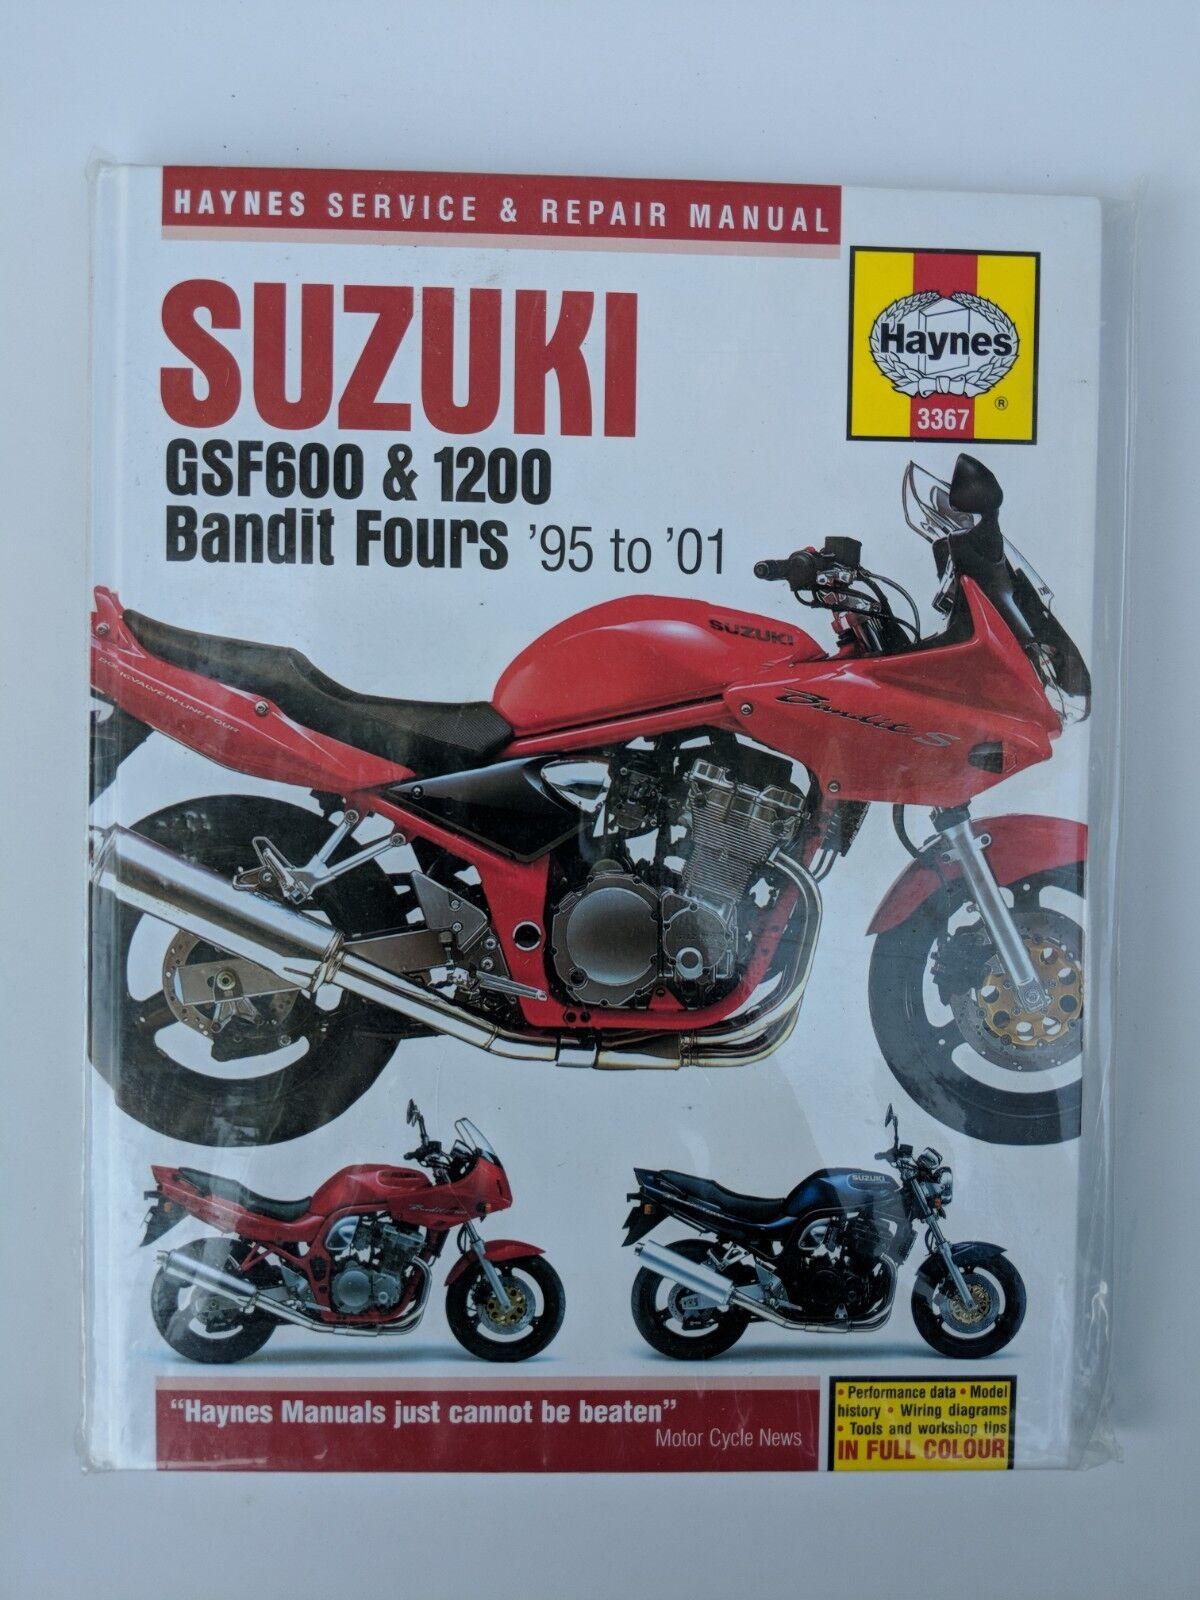 1995 to 2001 Suzuki Gsf600 & 1200 Bandit Four Service Manual Haynes 3367 |  eBay